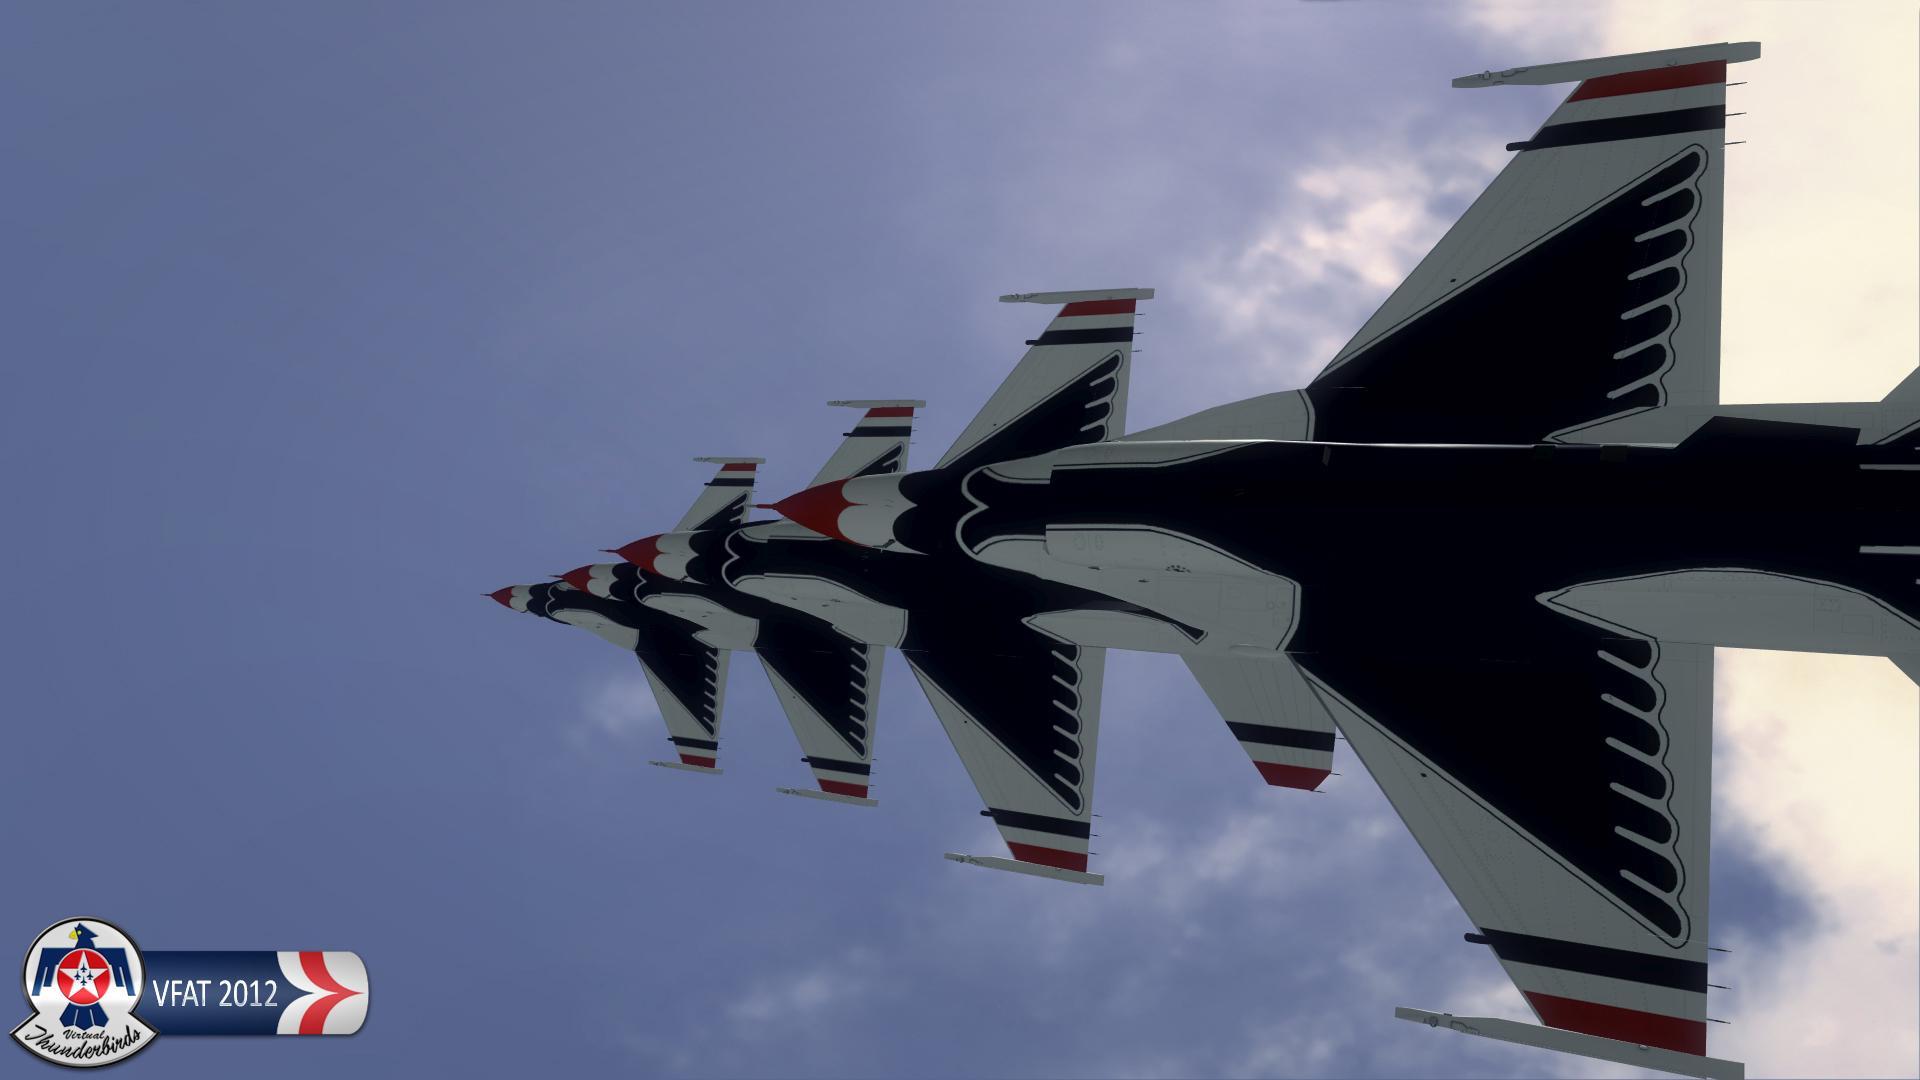 Virtual Thunderbird Screenshot of VFAT 2012